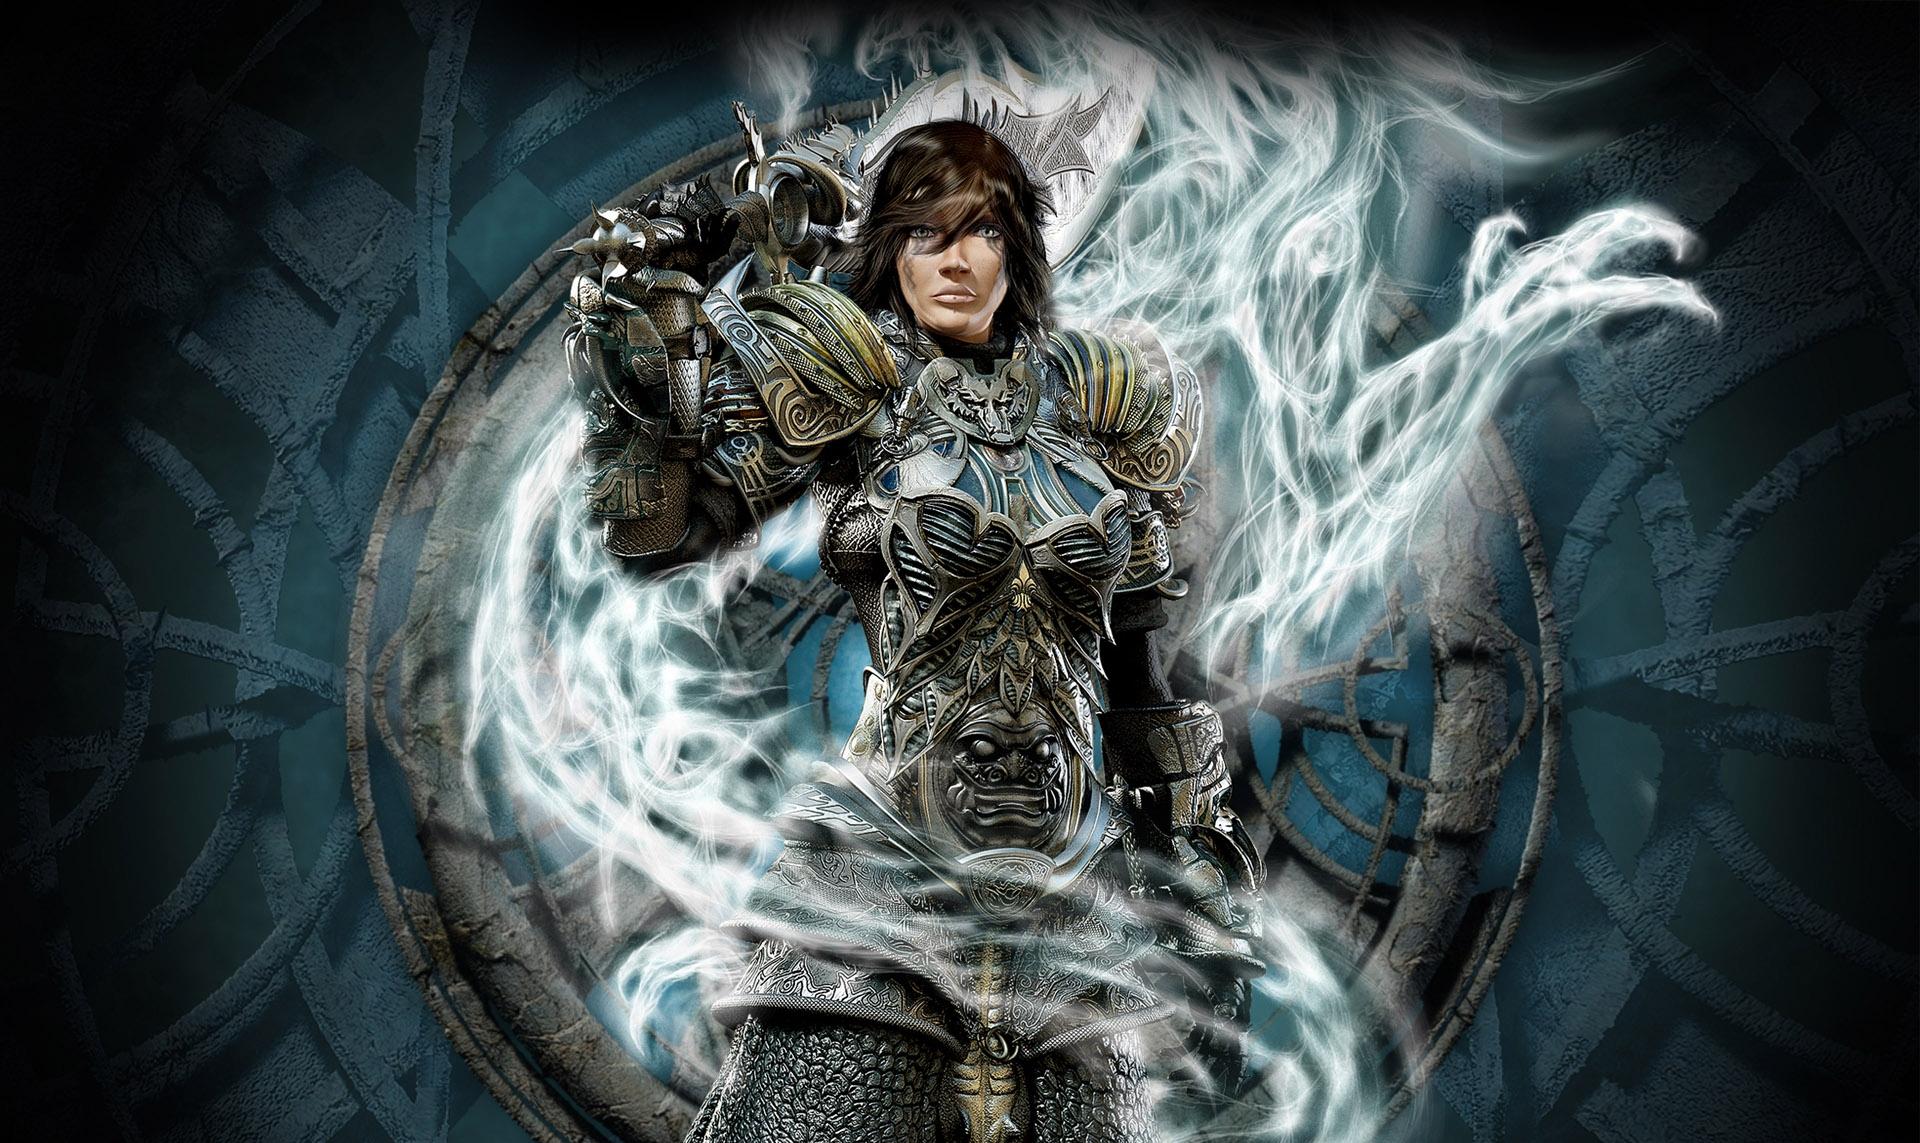 Warrior full hd wallpaper and background image 1920x1143 id82359 fantasy warrior wallpaper voltagebd Choice Image